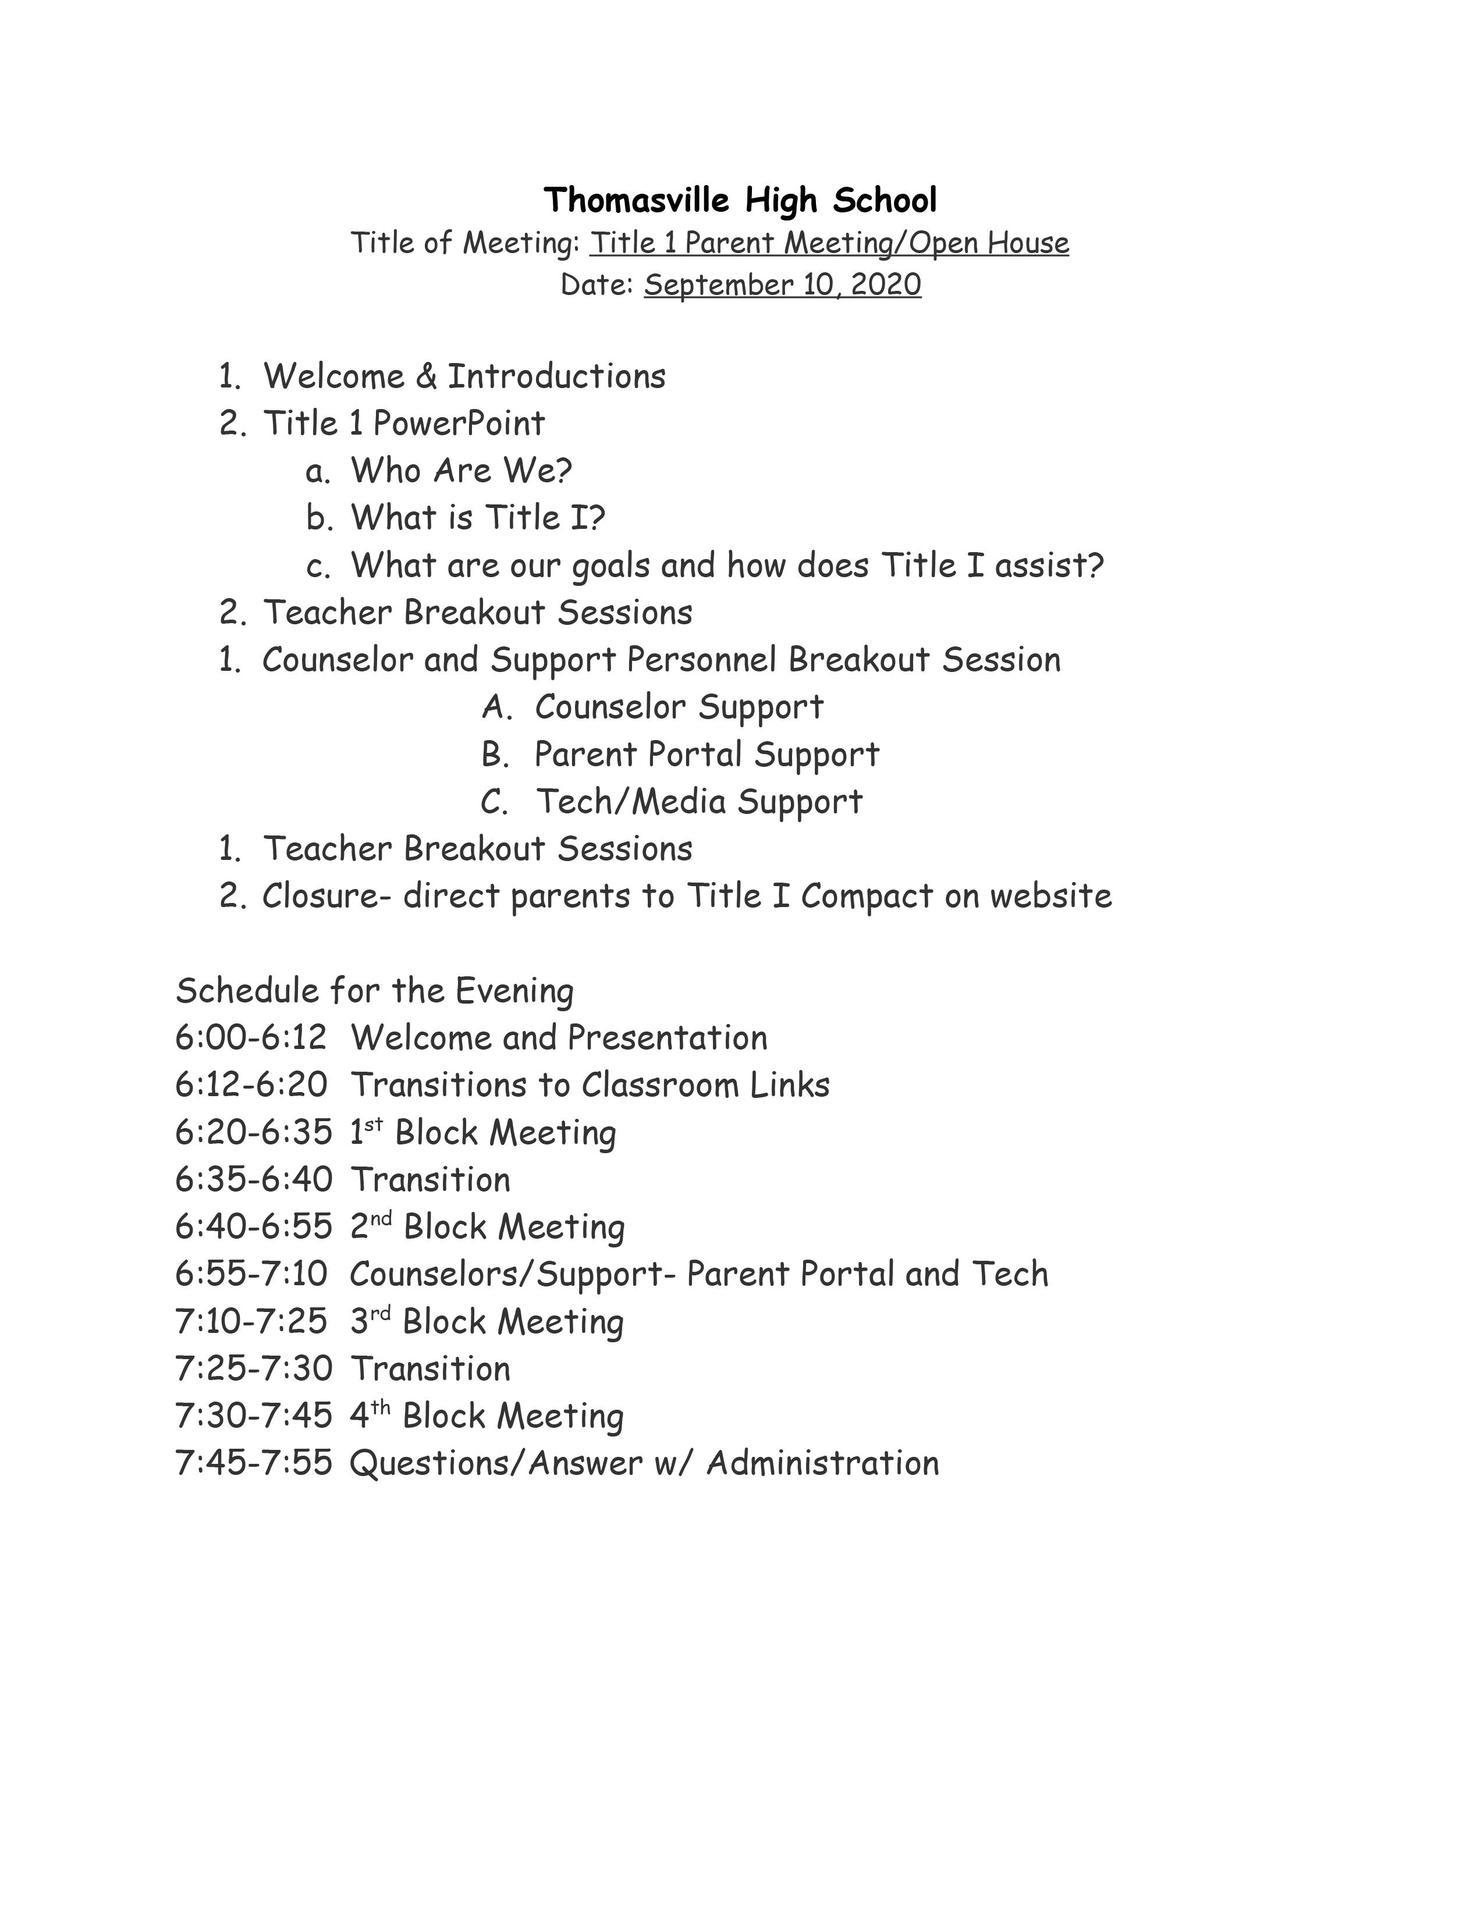 Open House Agenda 9-10-20